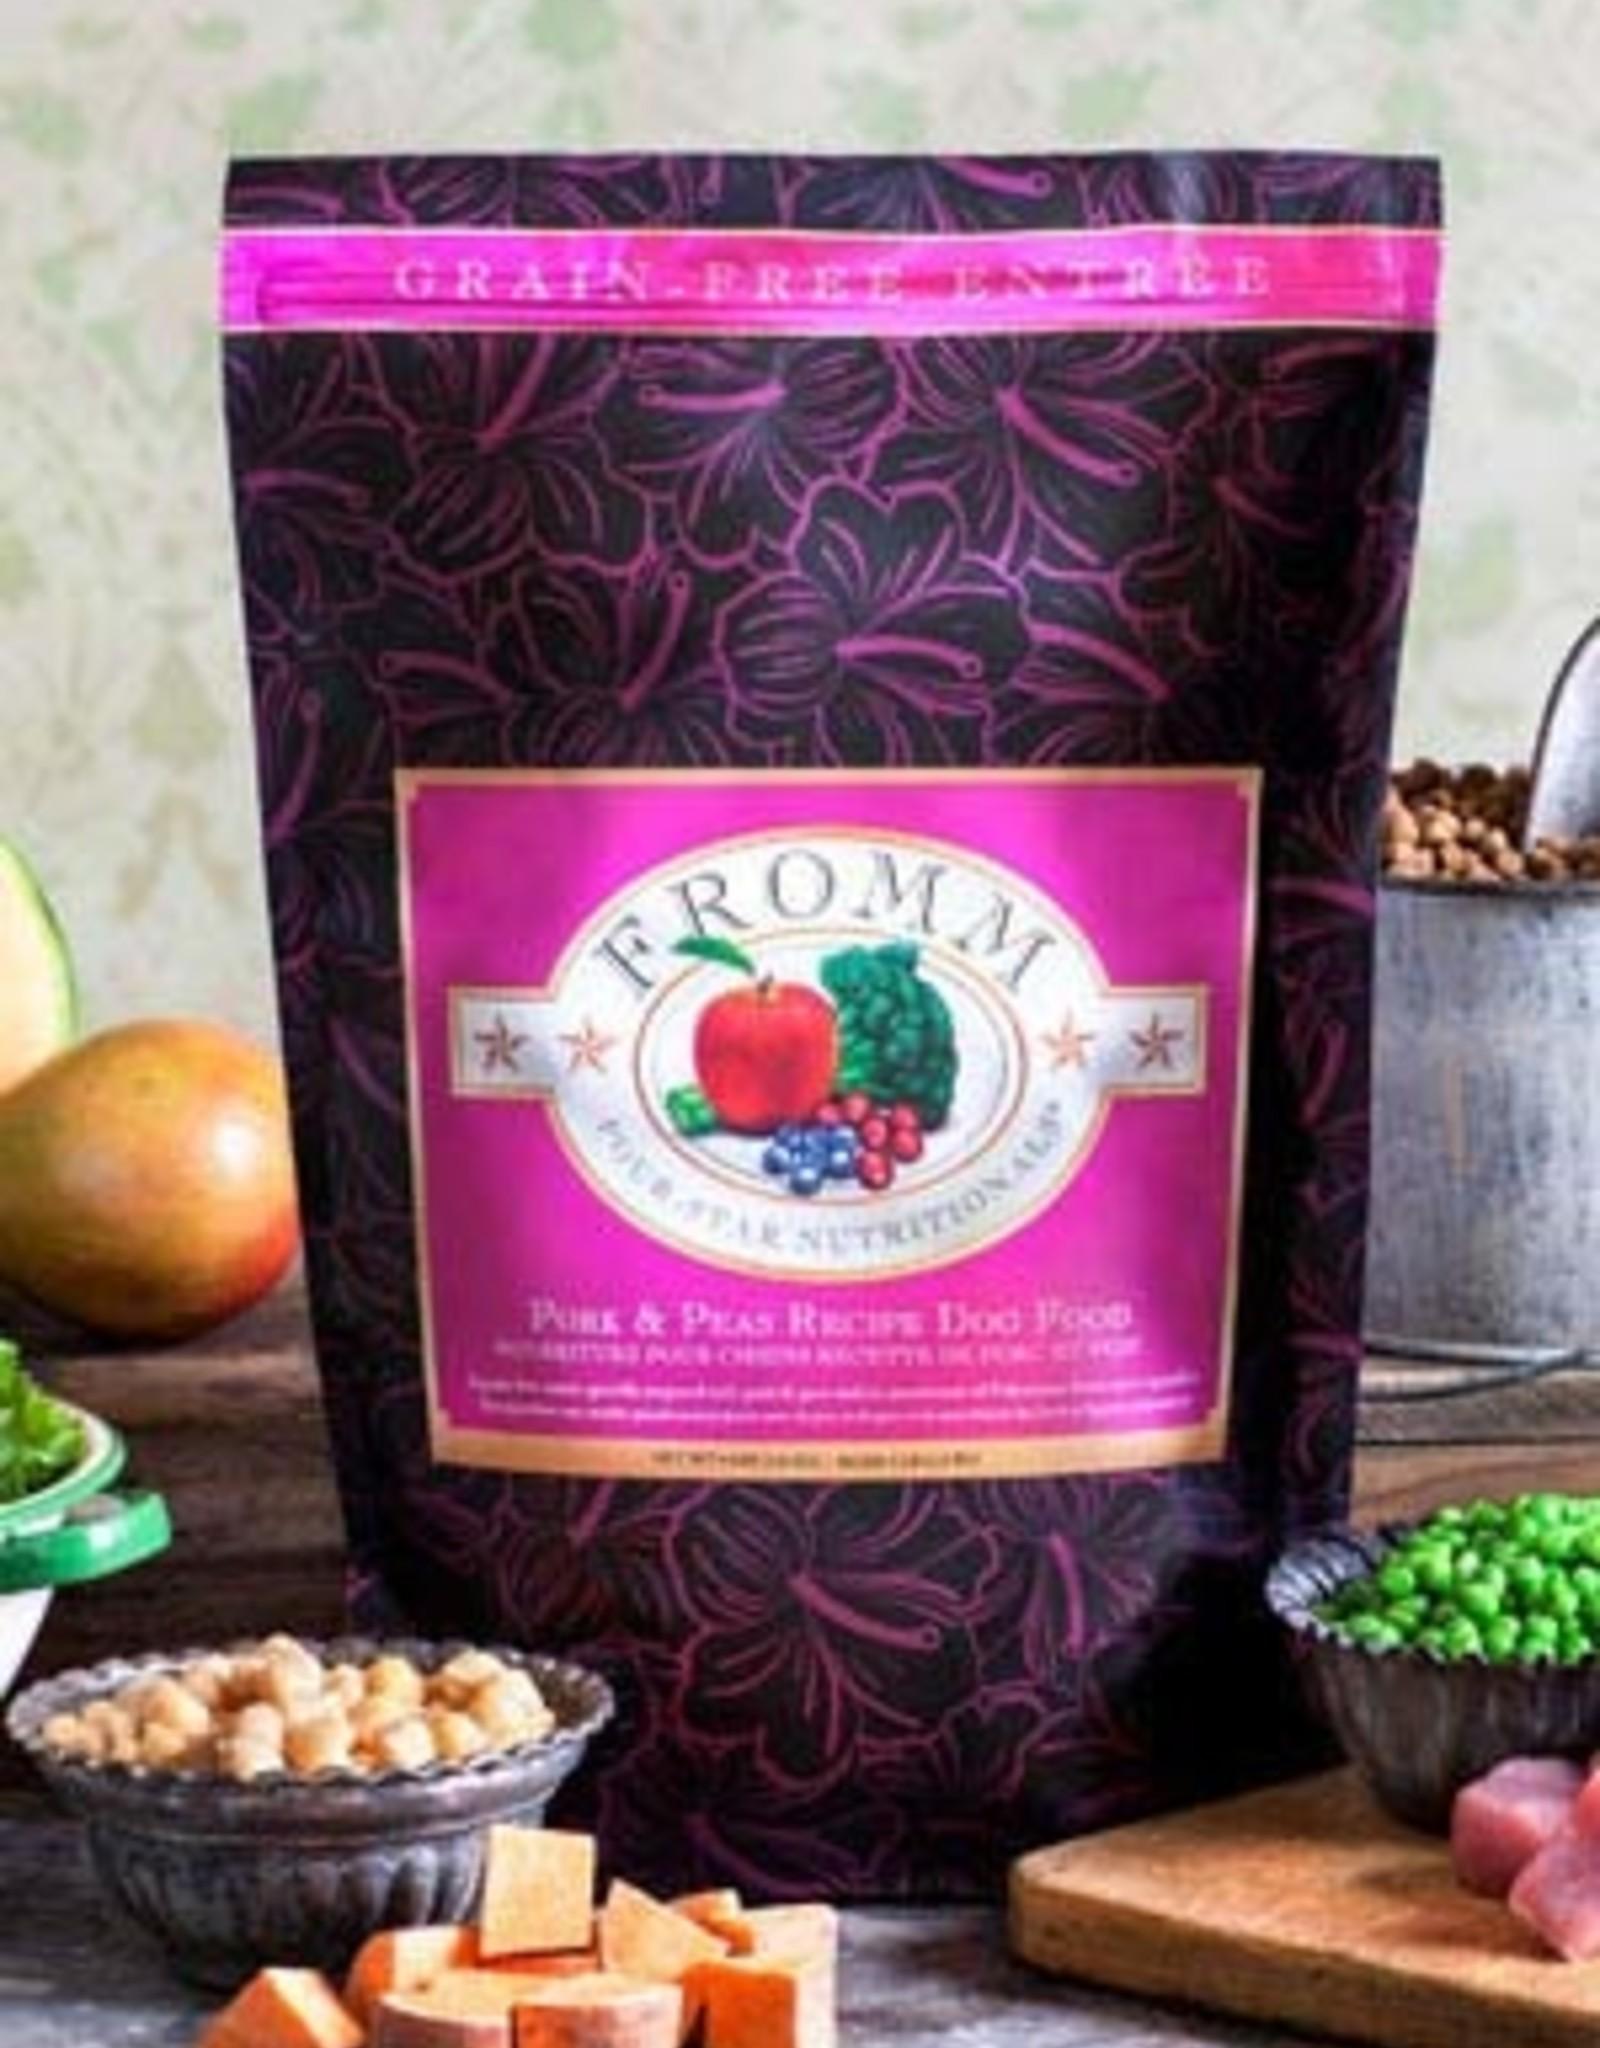 Fromm Family Pet Foods Dog Pork & Peas Recipe - Grain-Free 4lb